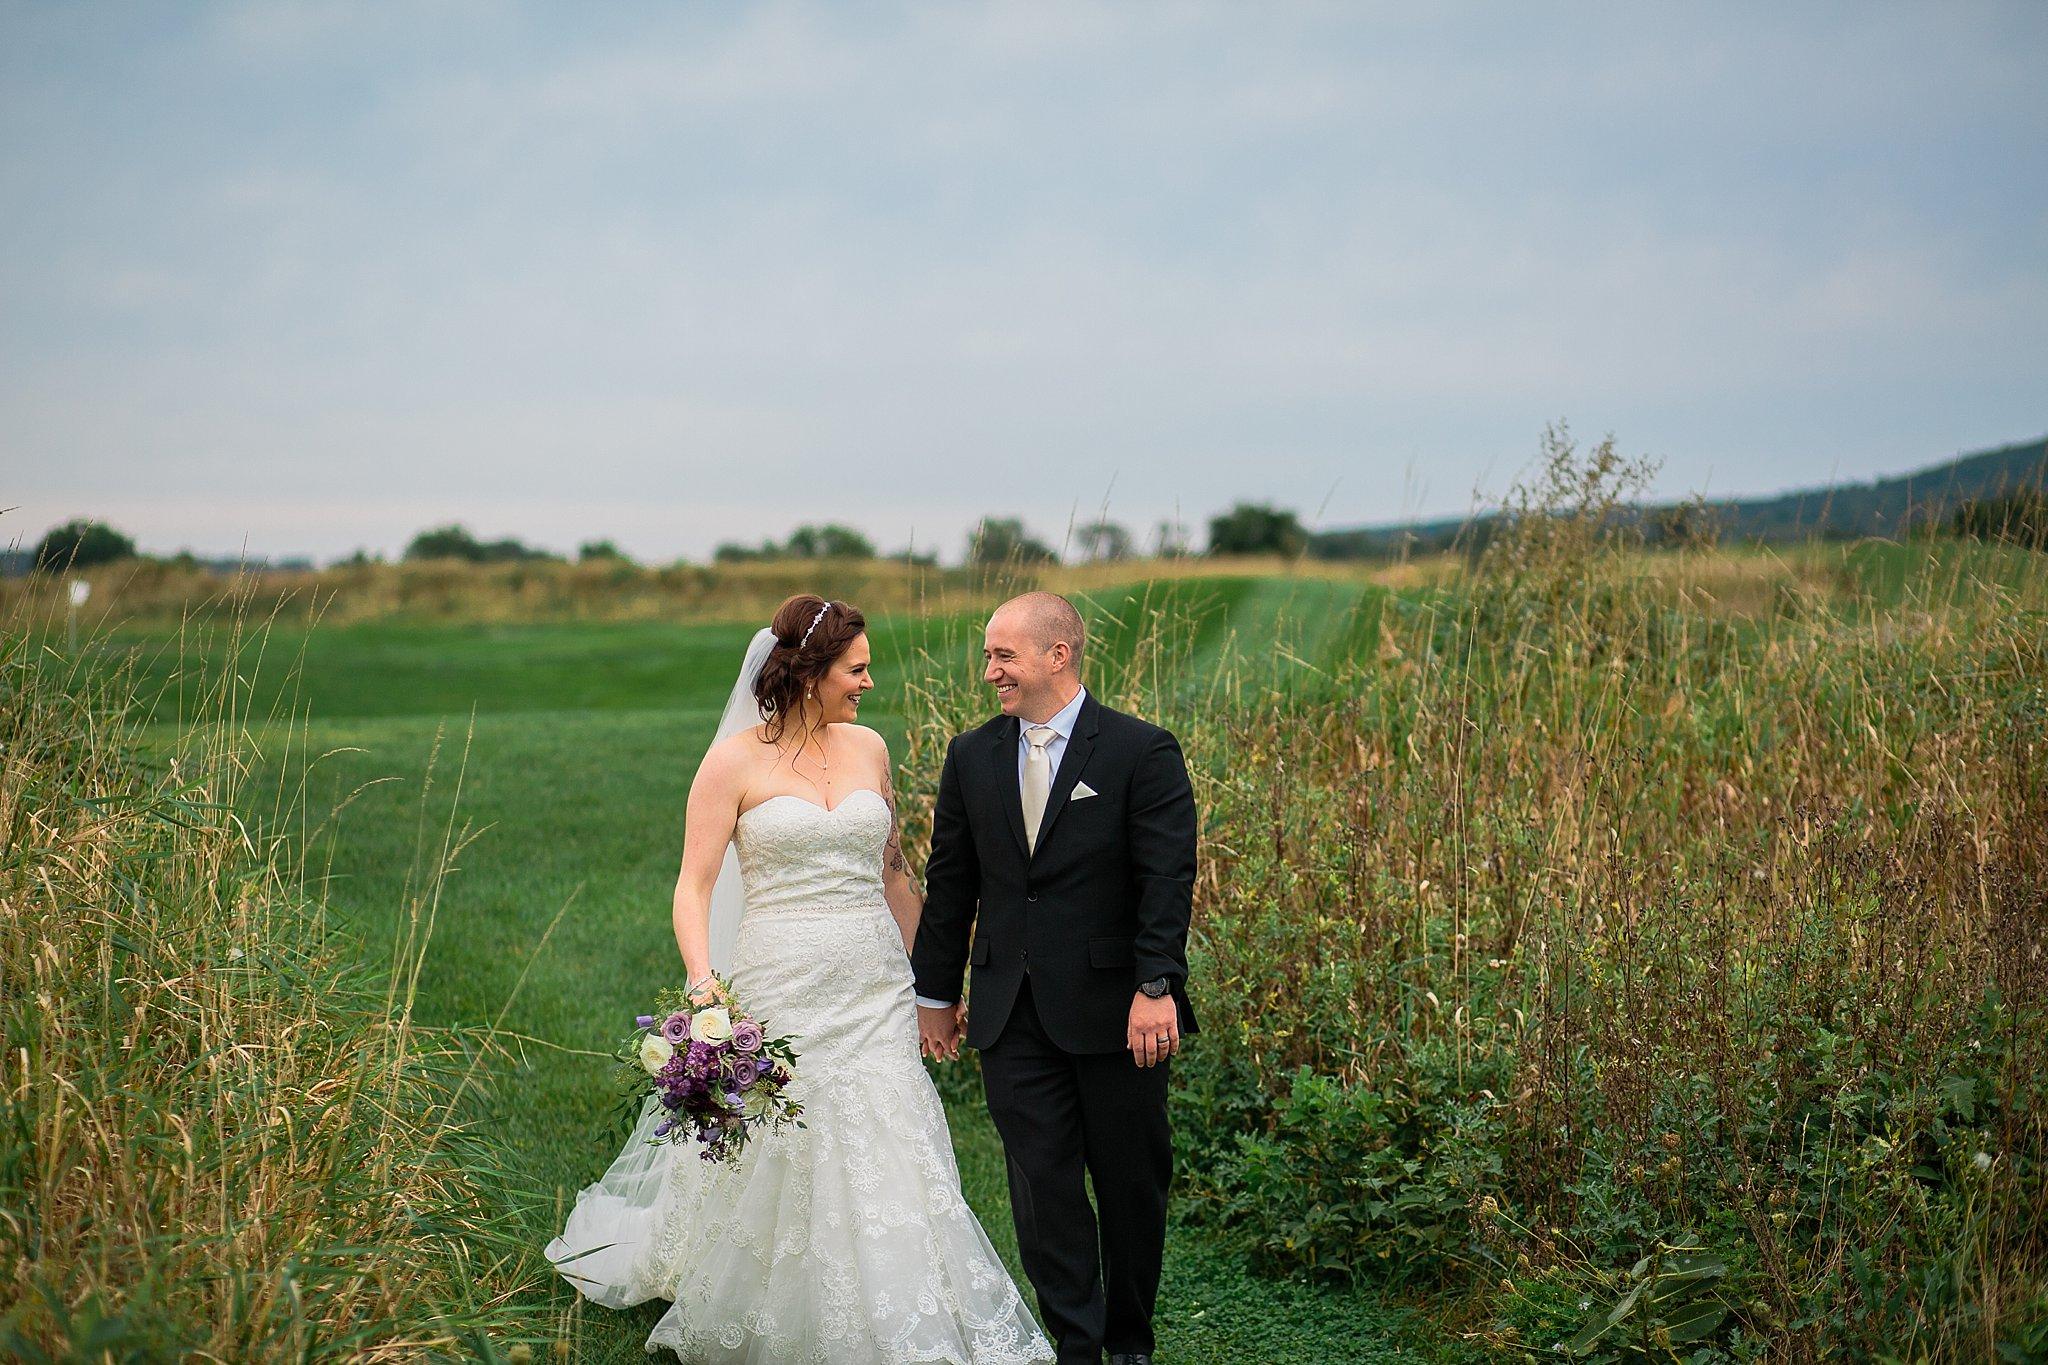 Links at Unionvale Wedding Lagrangeville Wedding Hudson Valley Wedding Photographer Sweet Alice Photography61.jpg